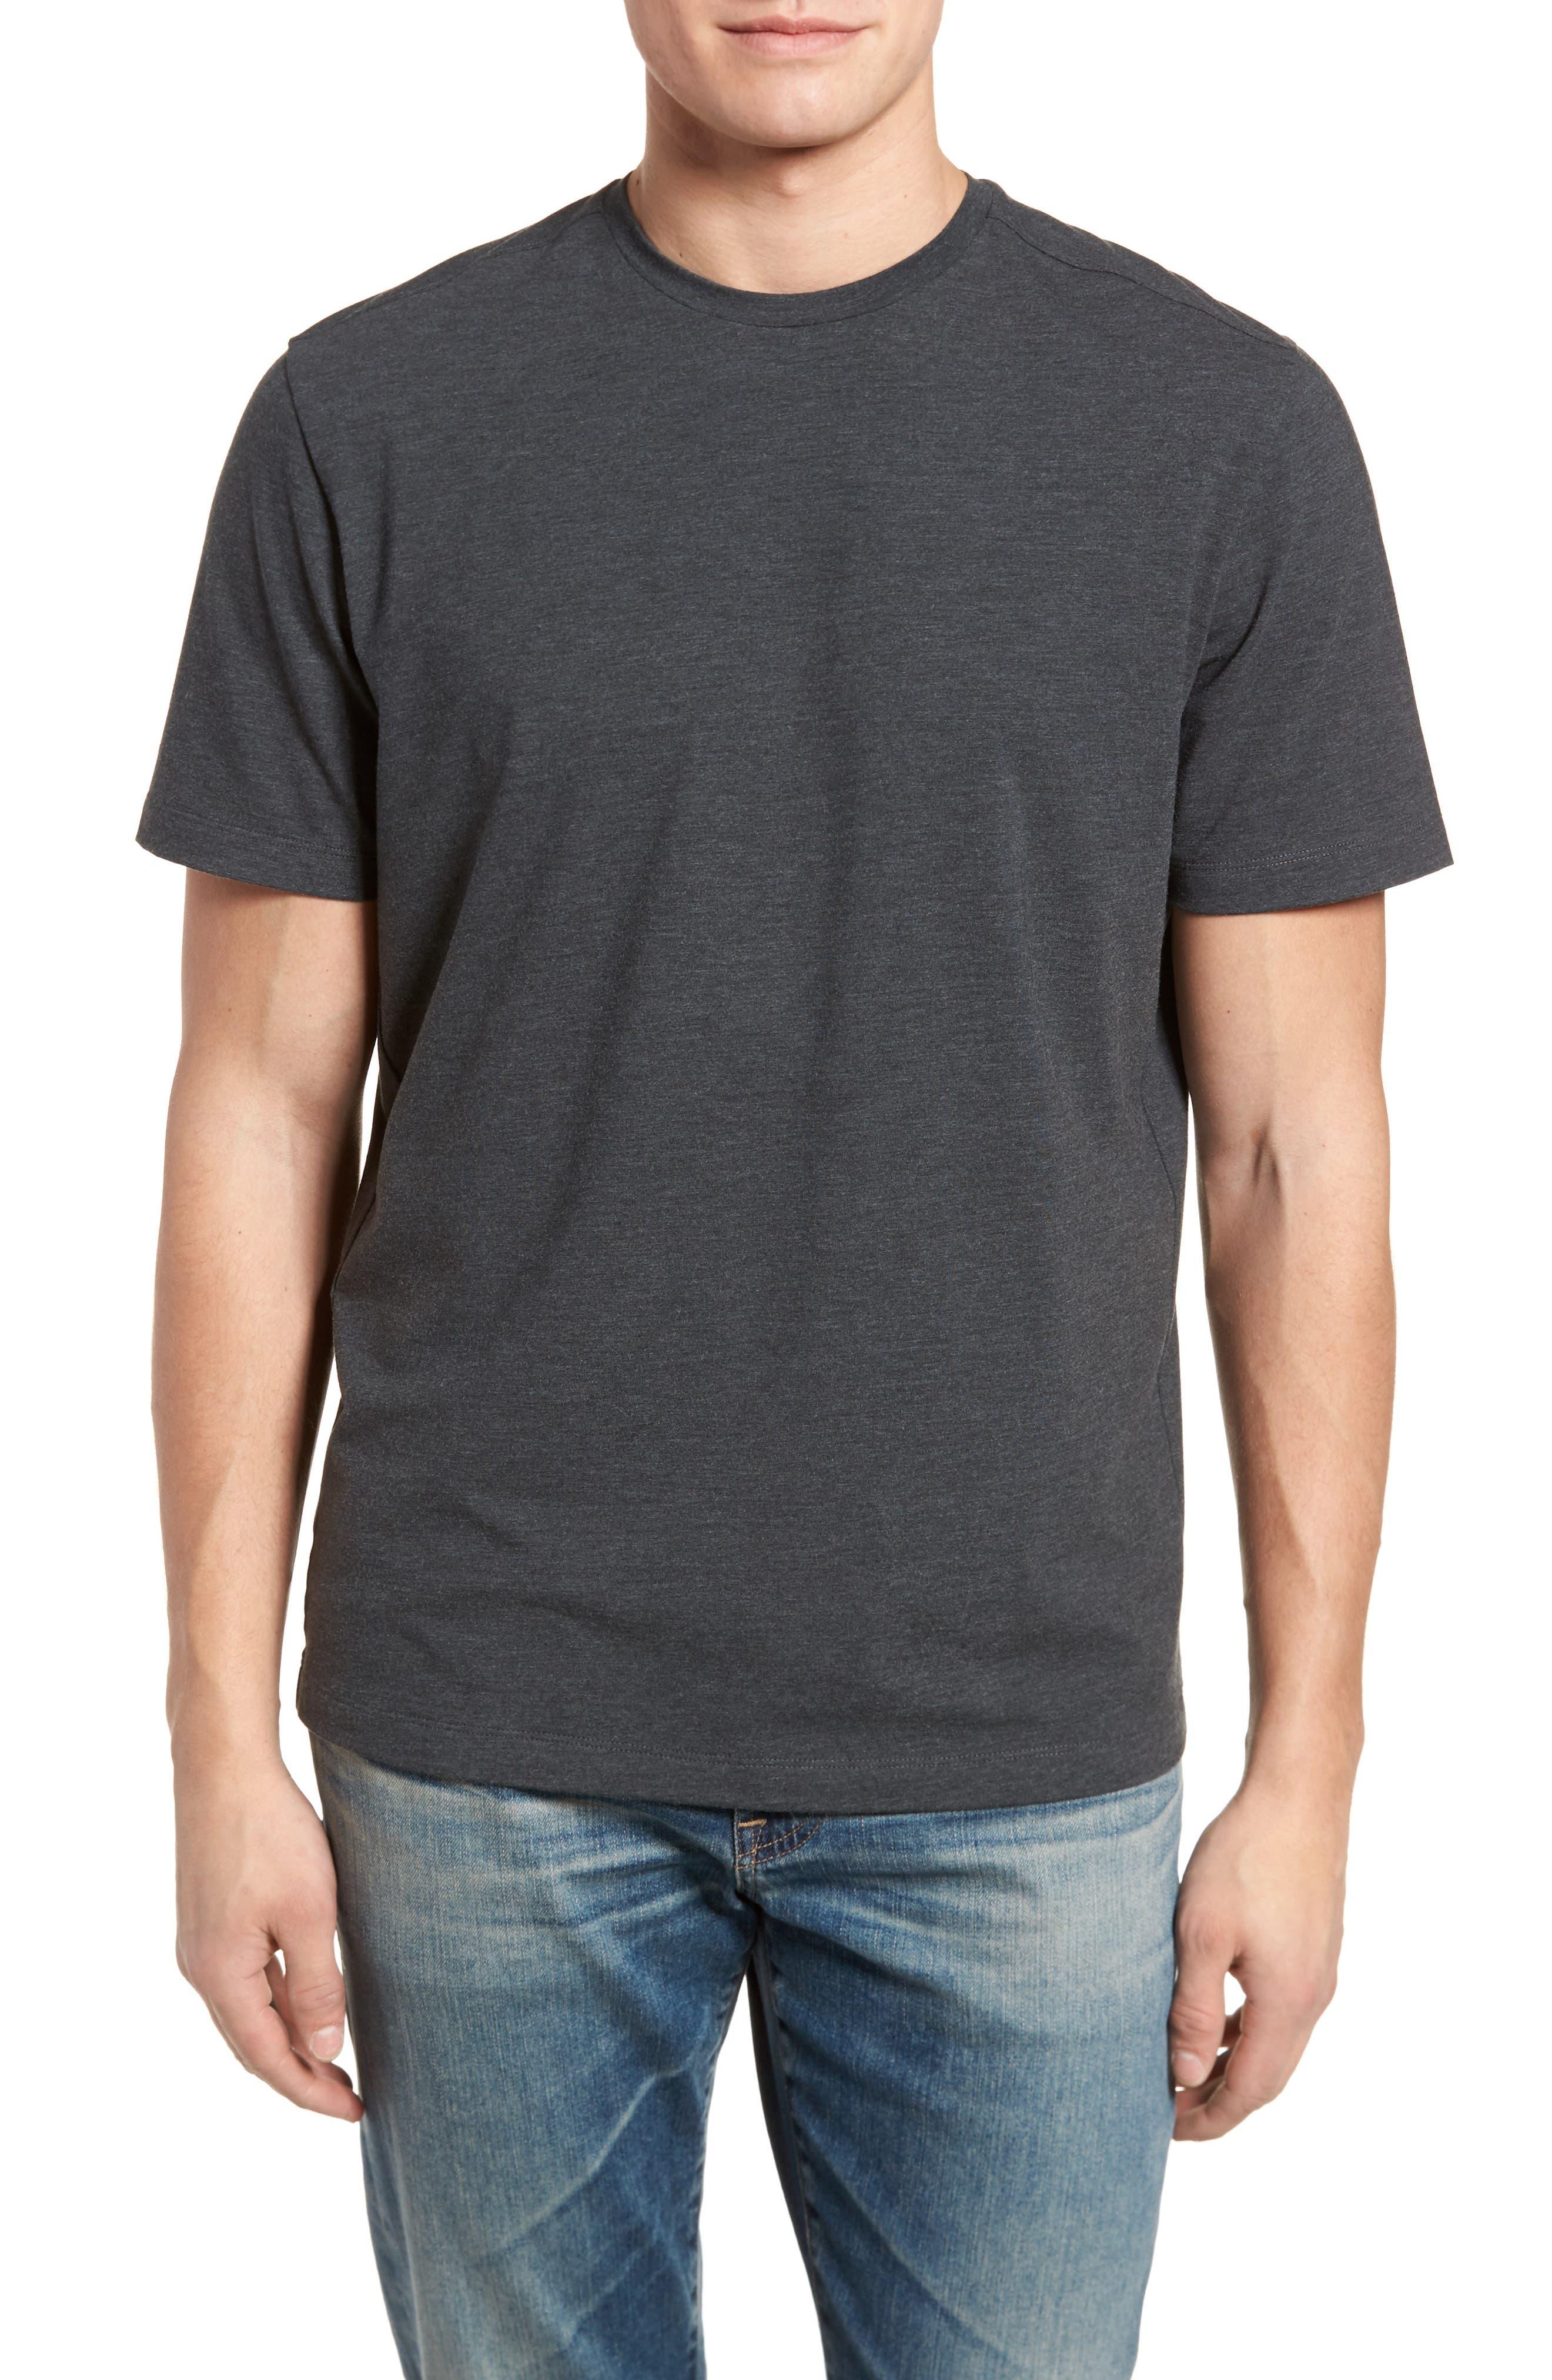 Tropicool T-Shirt,                             Main thumbnail 2, color,